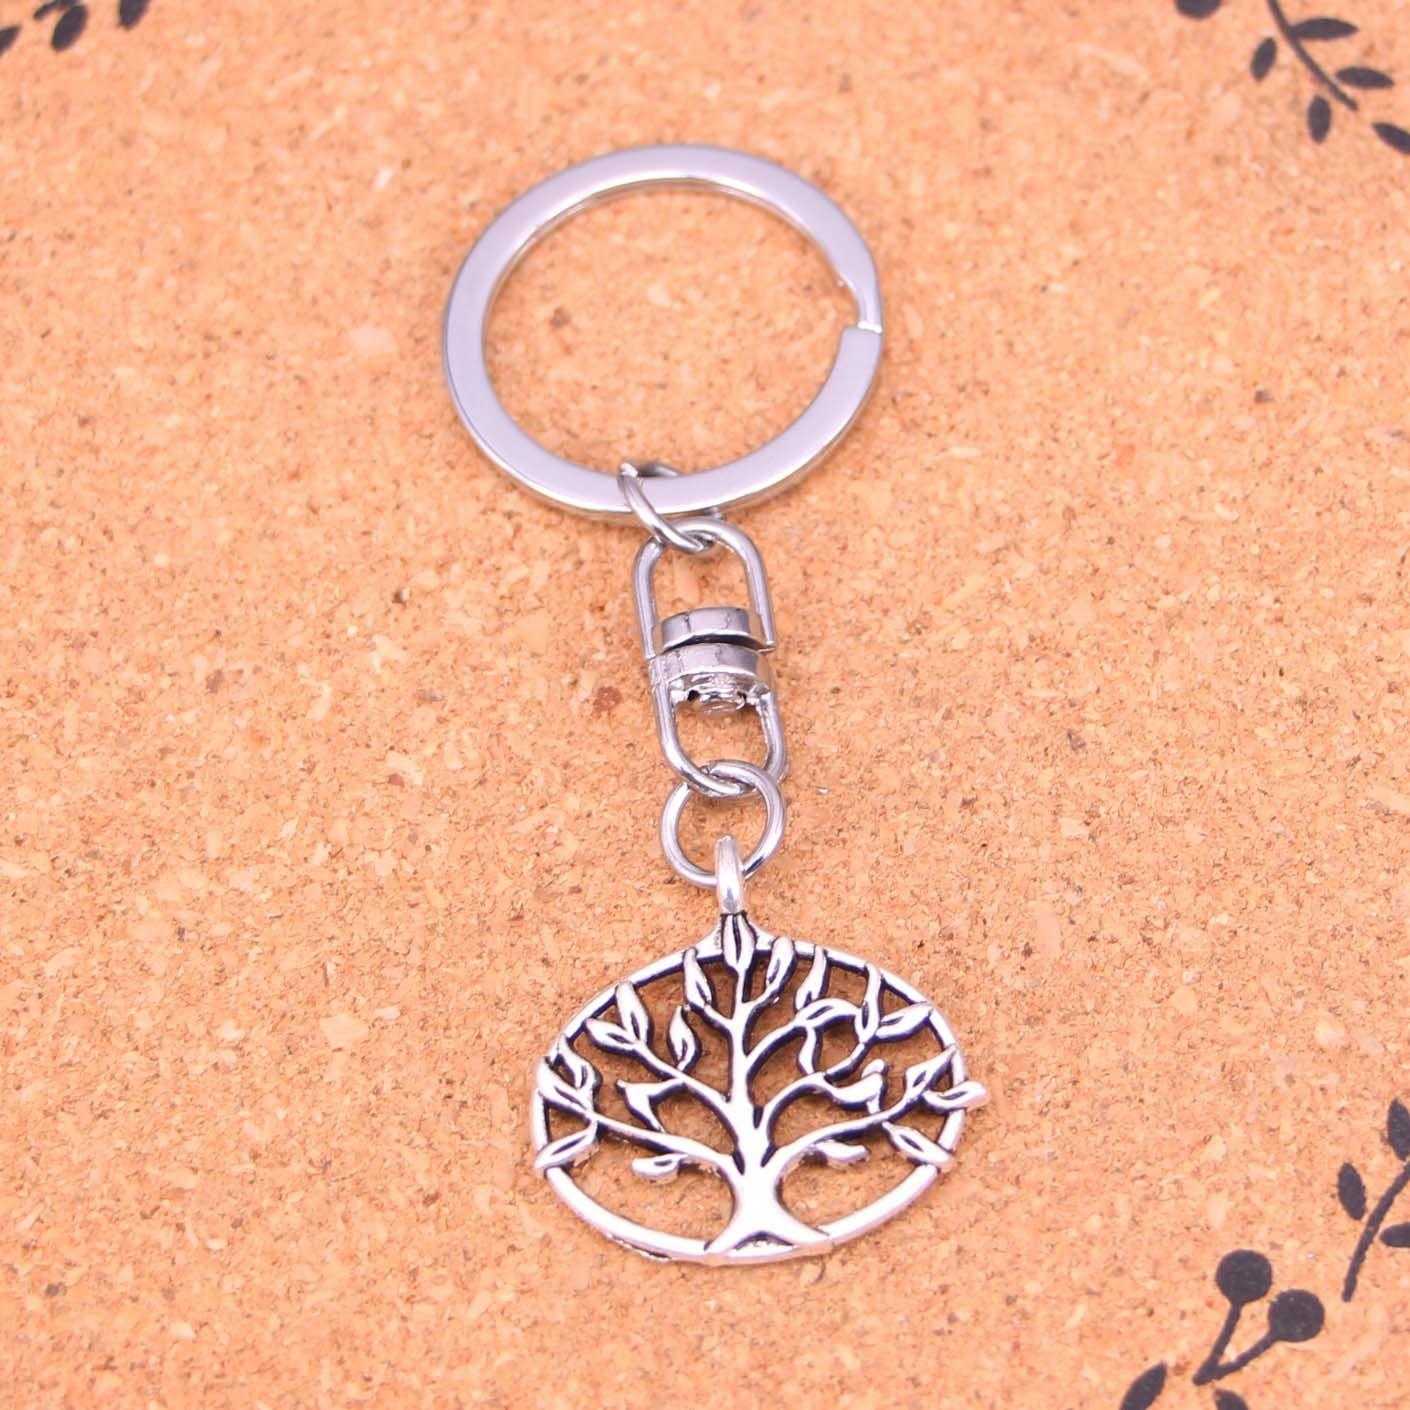 New Fashion Keychain 27*27mm life tree Pendants DIY Men Jewelry Car Key Chain Ring Holder Souvenir For Gift